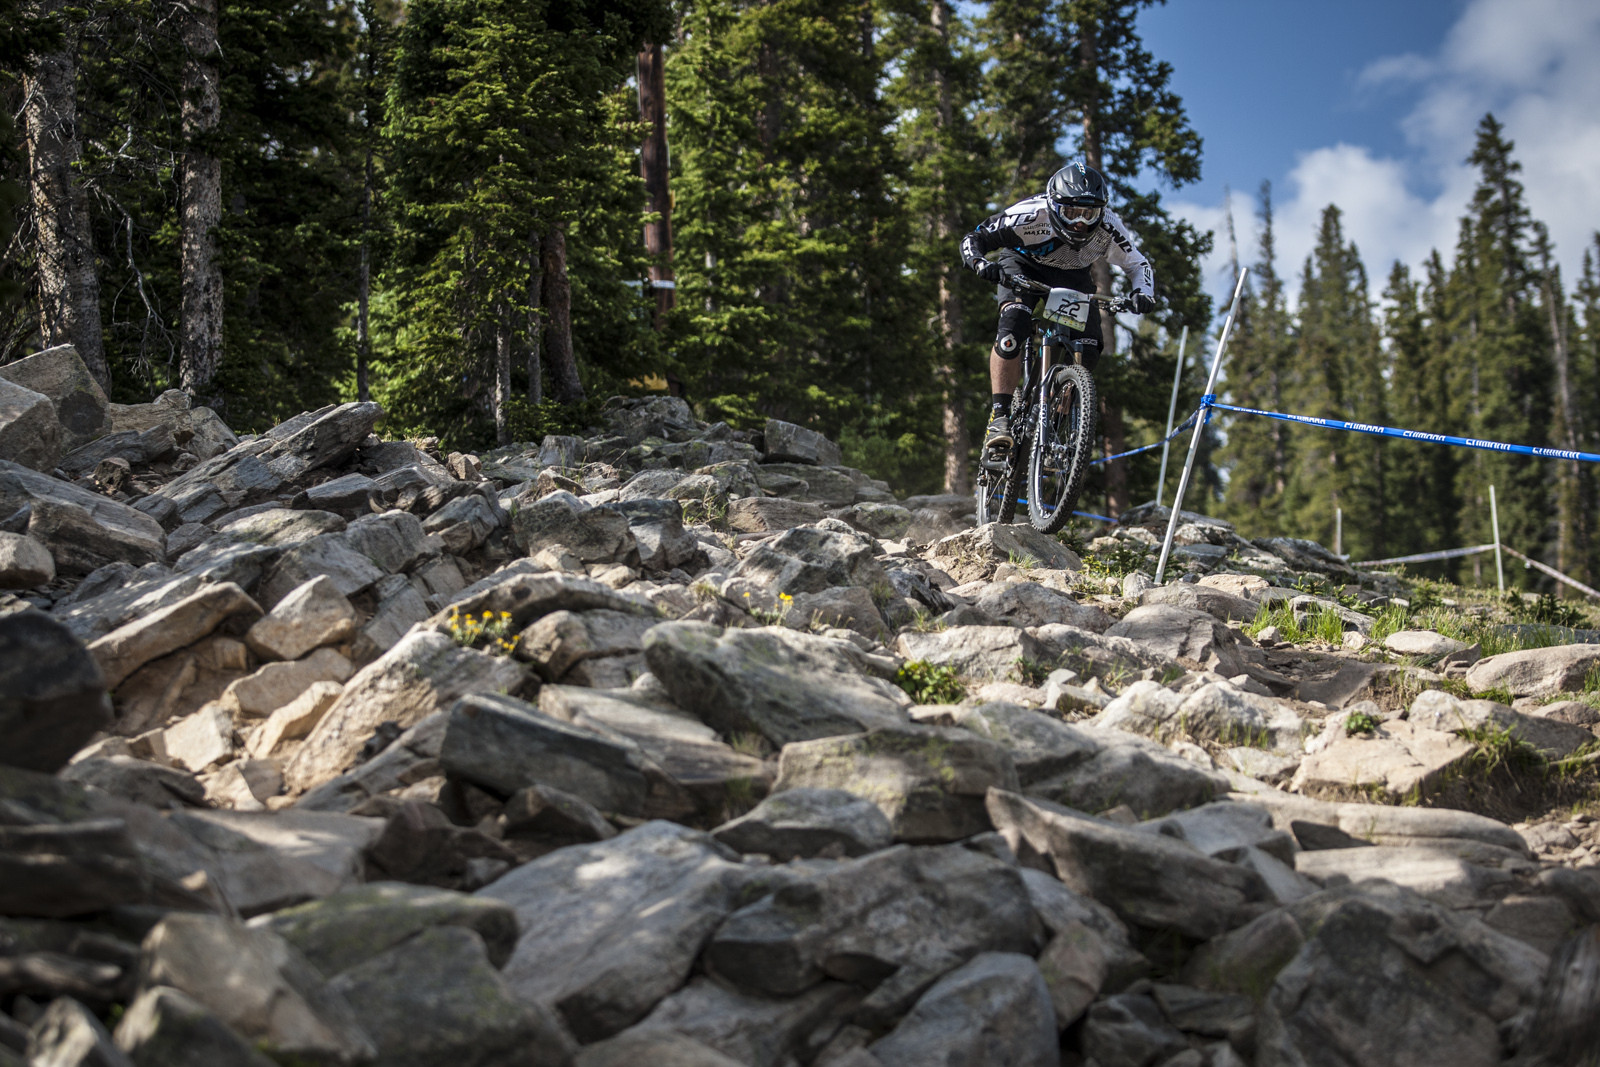 Race Report: North American Enduro Tour / Big Mountain Enduro, Keystone, Colorado - Photos, Videos from the Keystone Big Mountain Enduro, Part of the North American Enduro Tour - Mountain Biking Pictures - Vital MTB